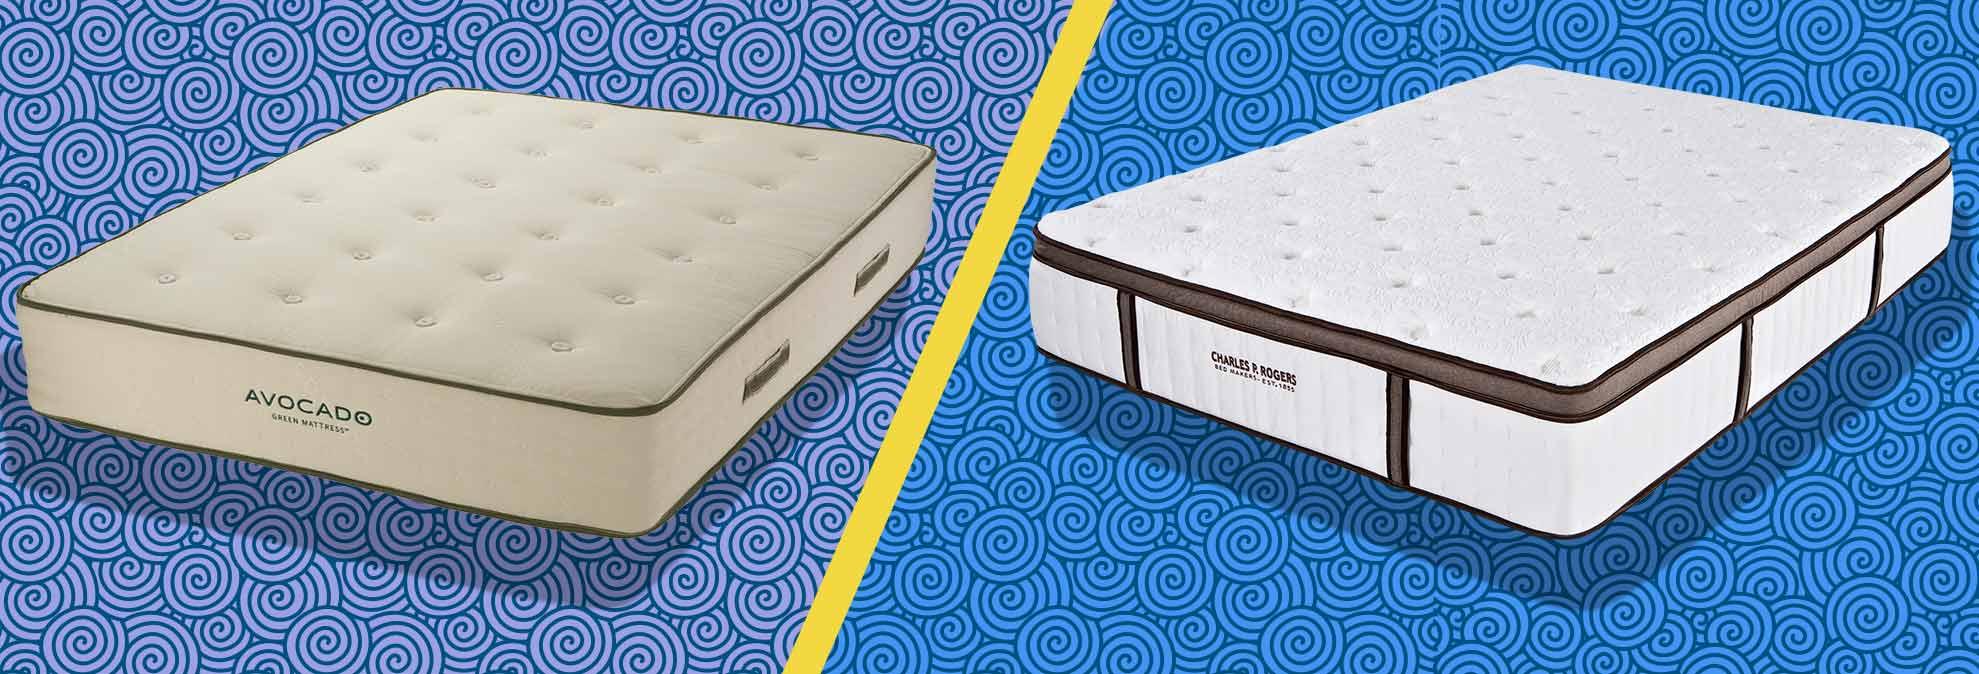 avocado green vs charles p rogers mattress review consumer reports